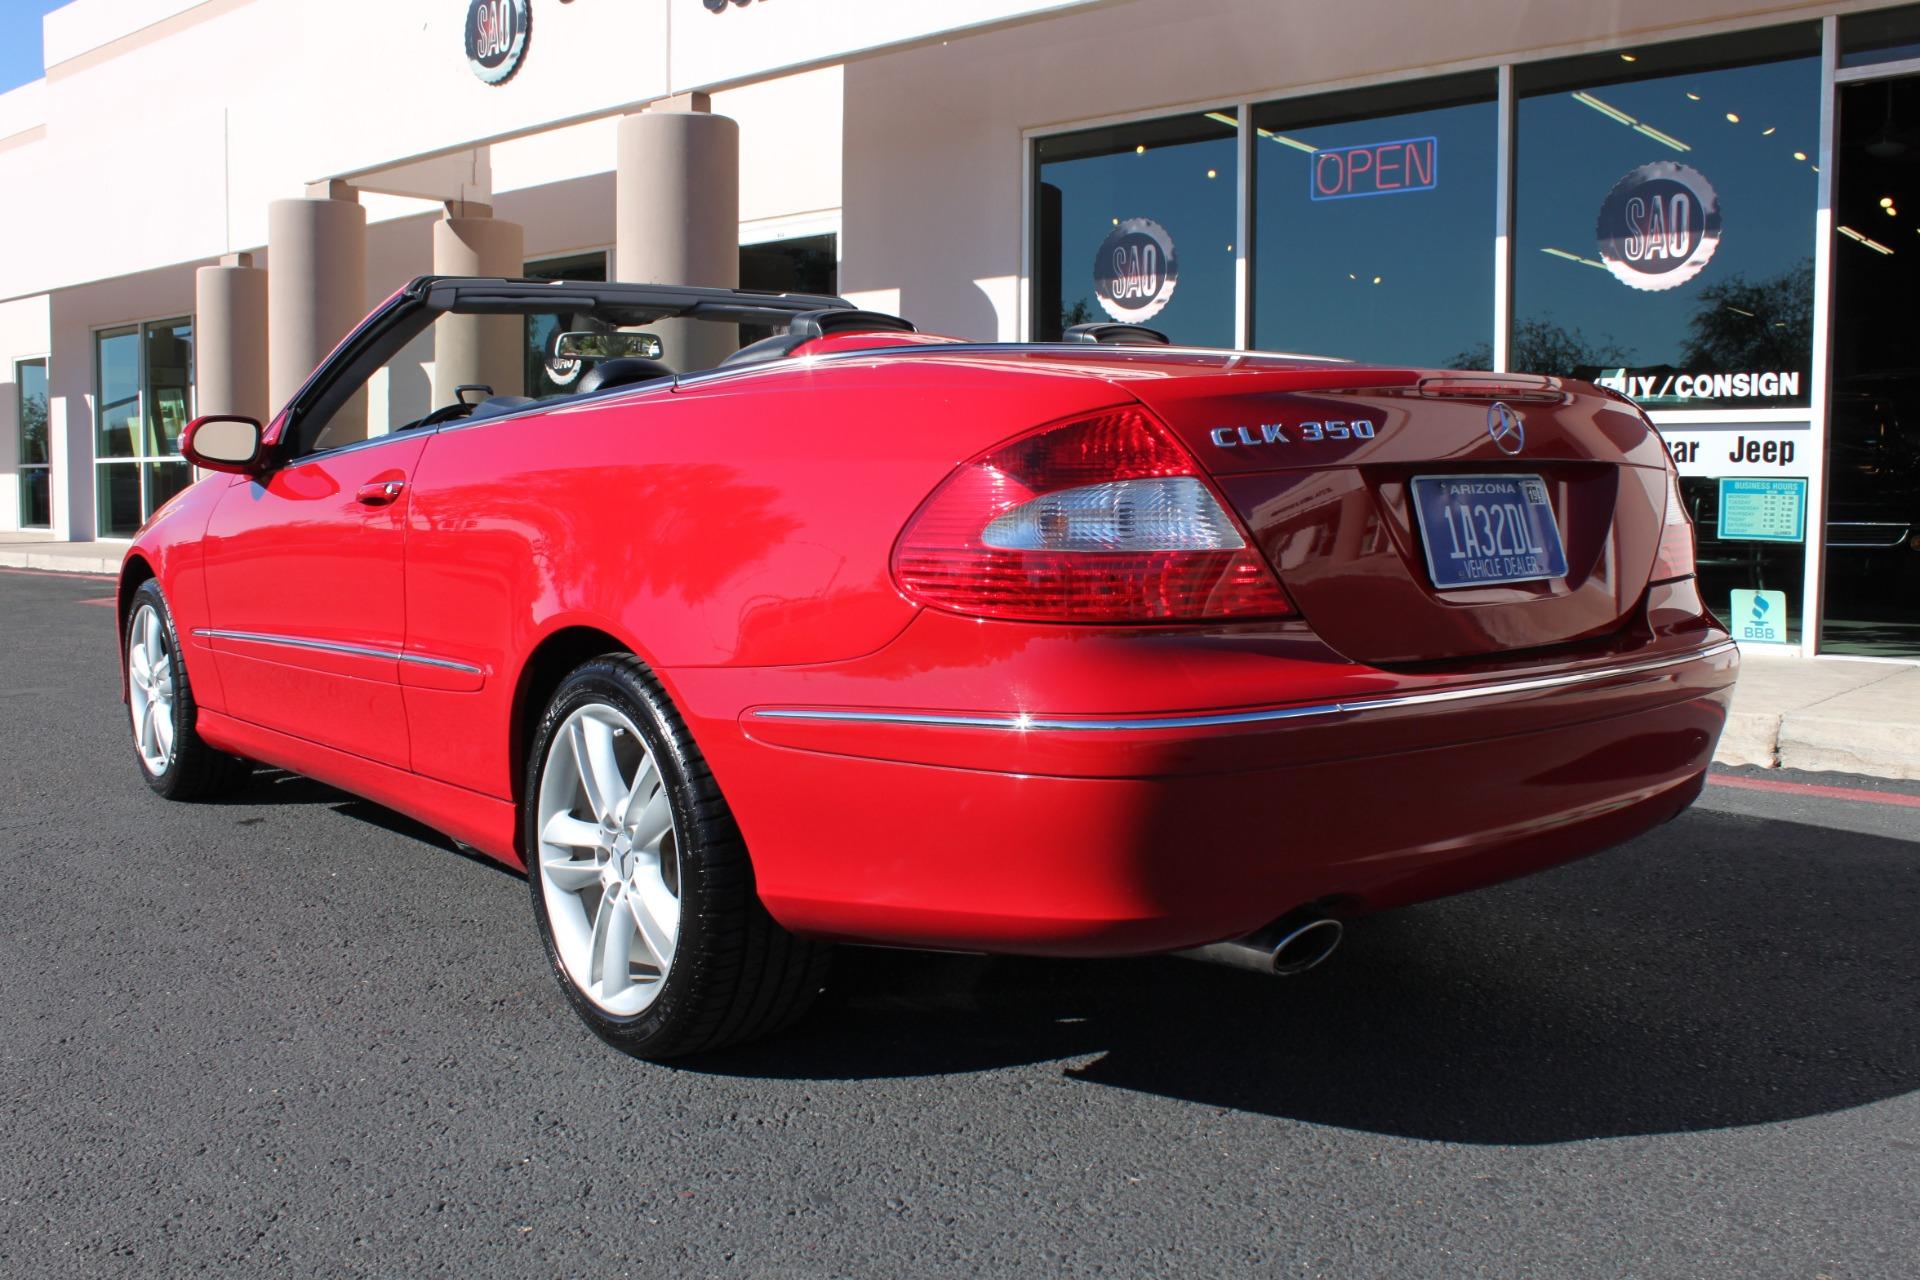 Used-2006-Mercedes-Benz-CLK-Class-CLK350-Cabriolet-35L-Grand-Wagoneer